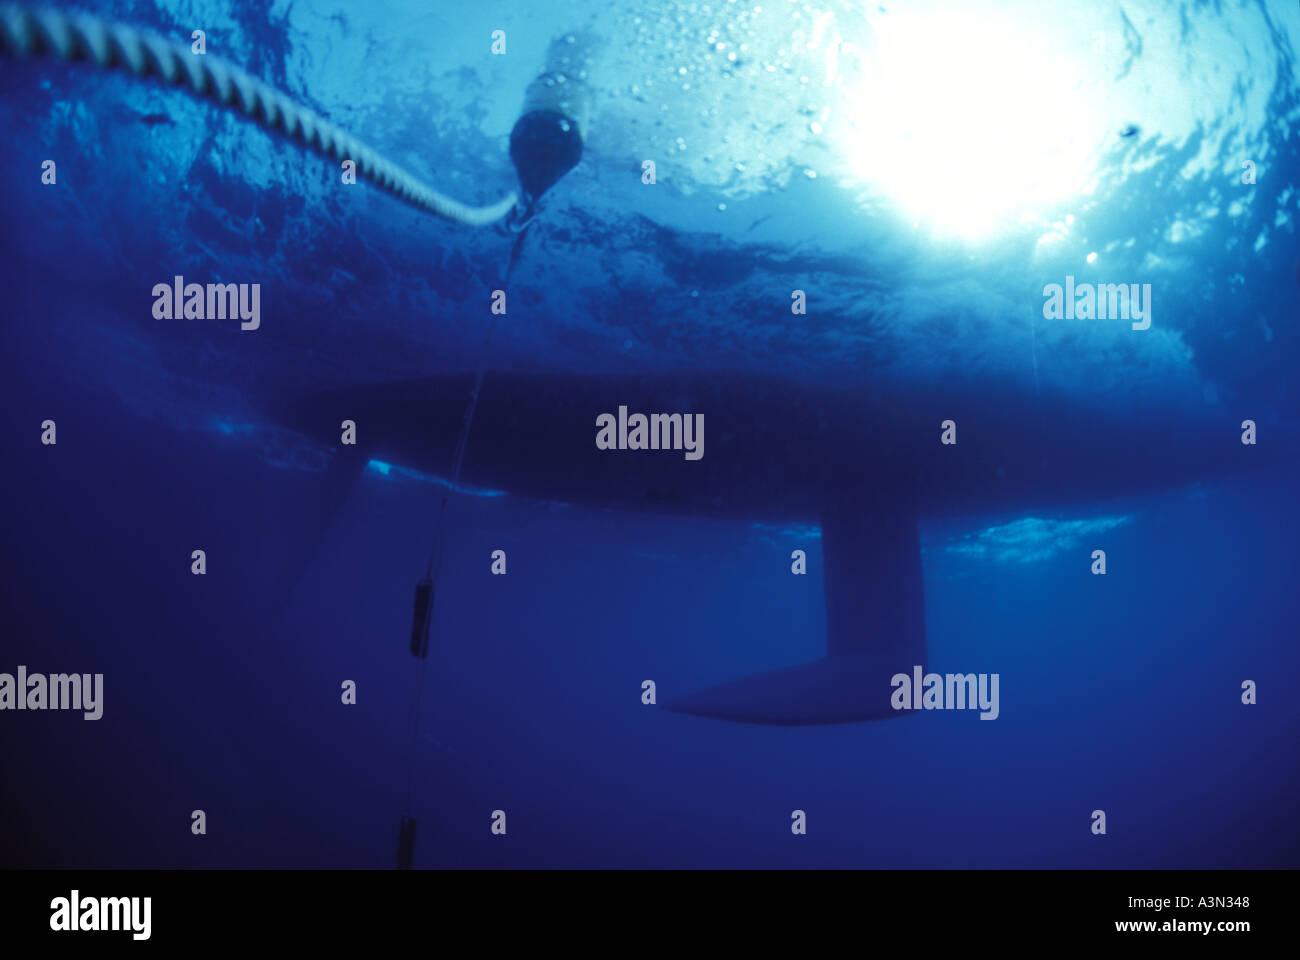 Vista submarina de racing marca redondeo Imagen De Stock